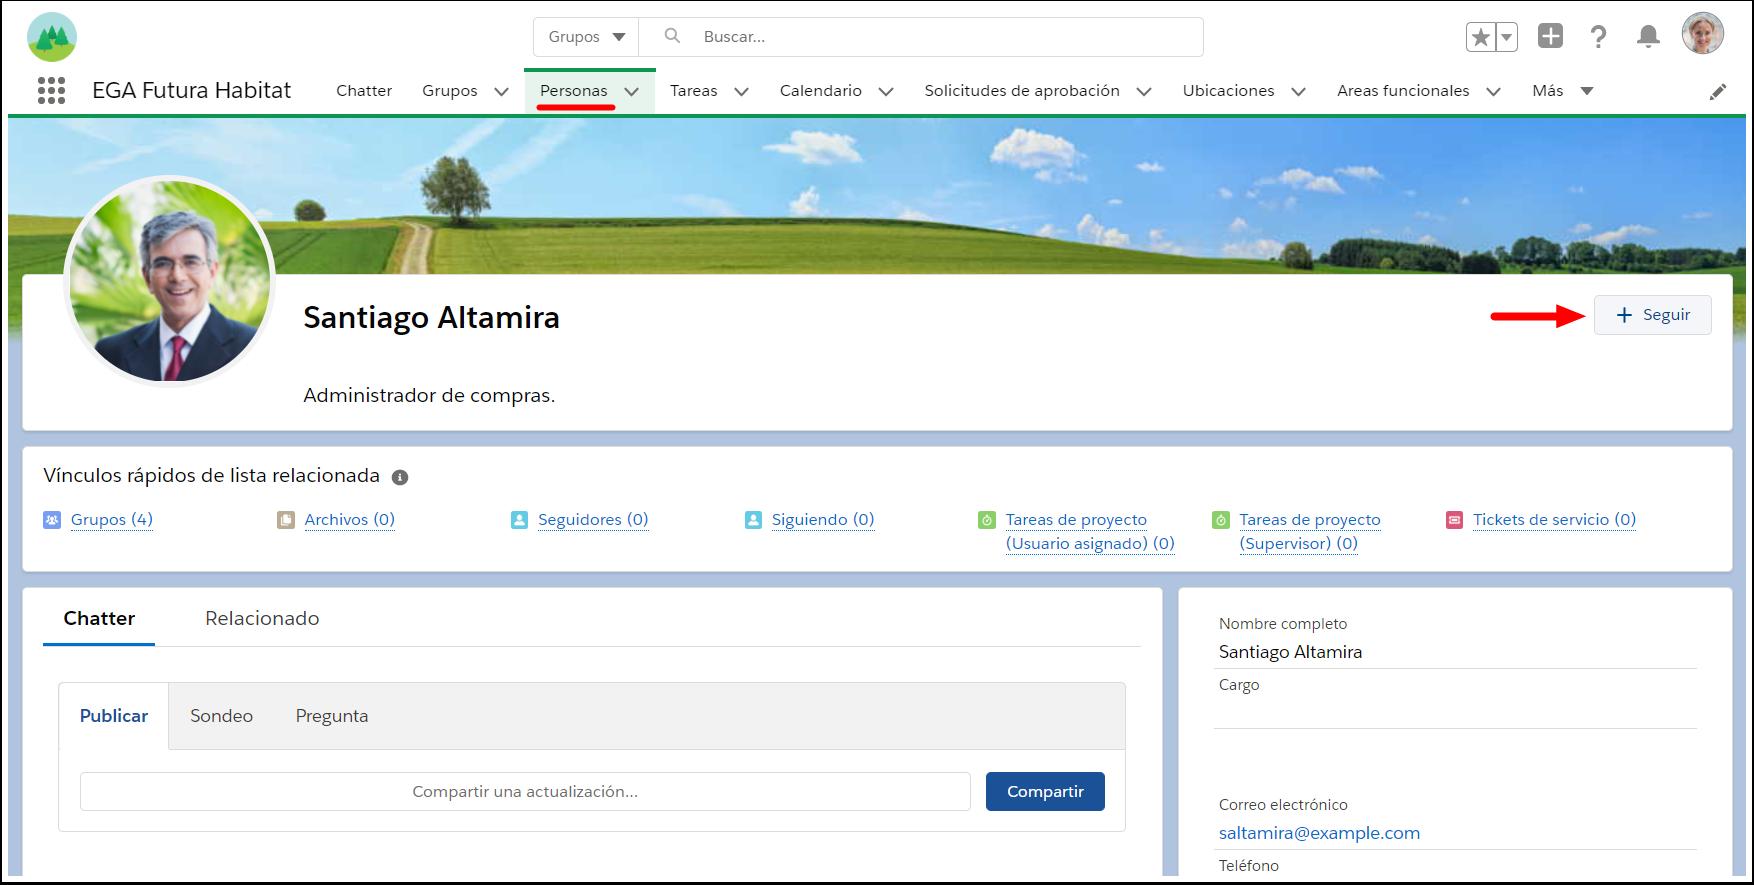 Seguir usuario persona Chatter Plataforma EGA Futura ERP nube